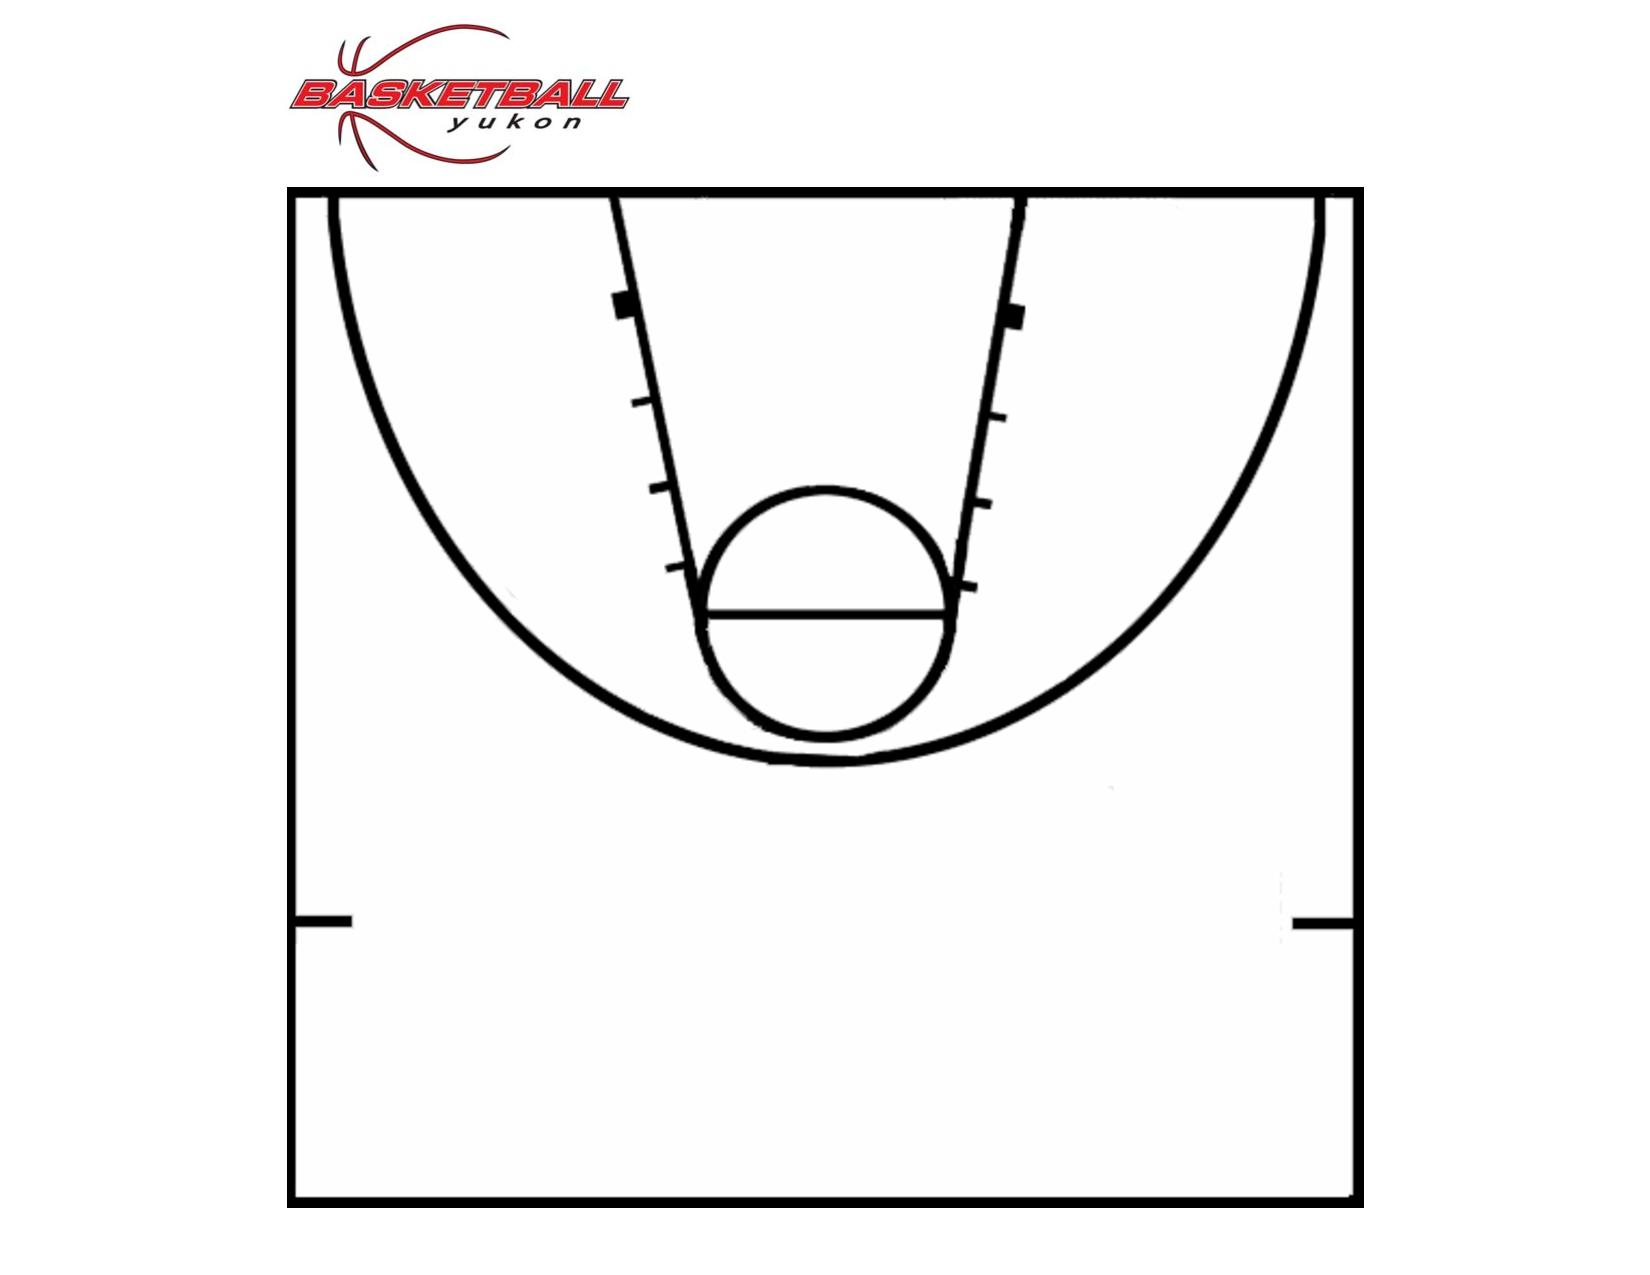 Printable Basketball Court   Clipart Panda - Free Clipart Images - Free Printable Basketball Court